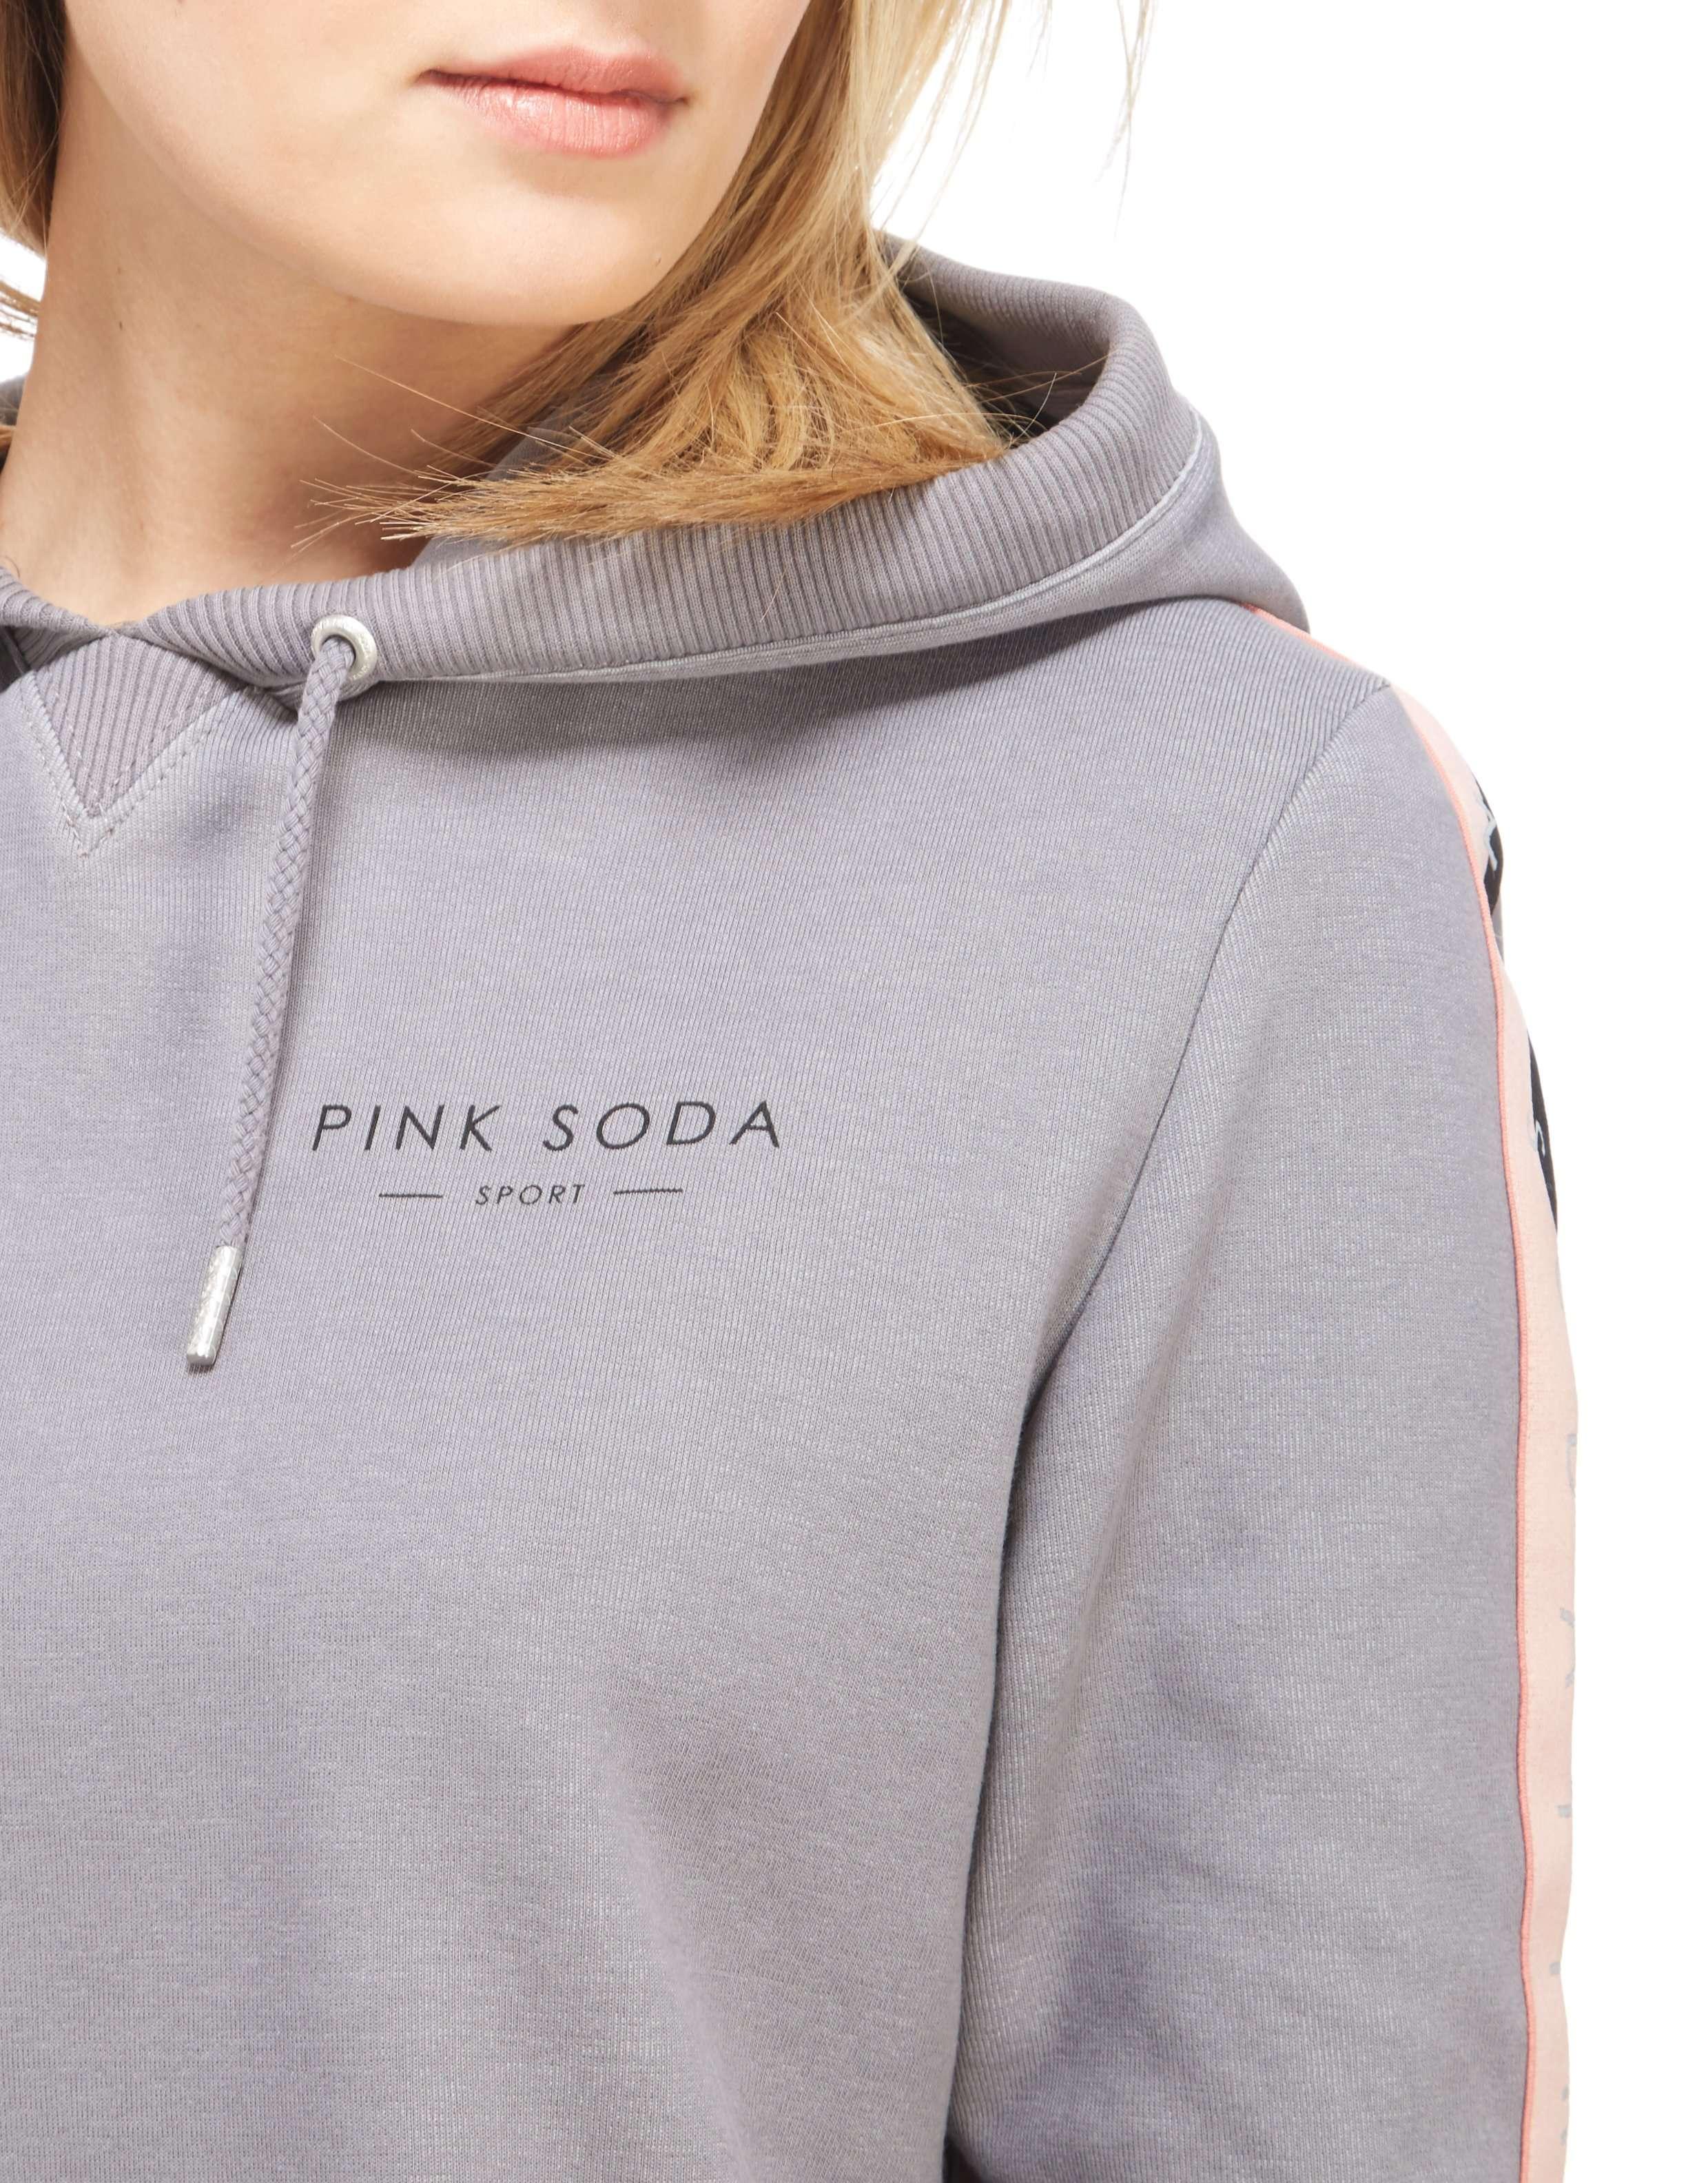 Pink Soda Sport Boxy Crop Overhead Hoody